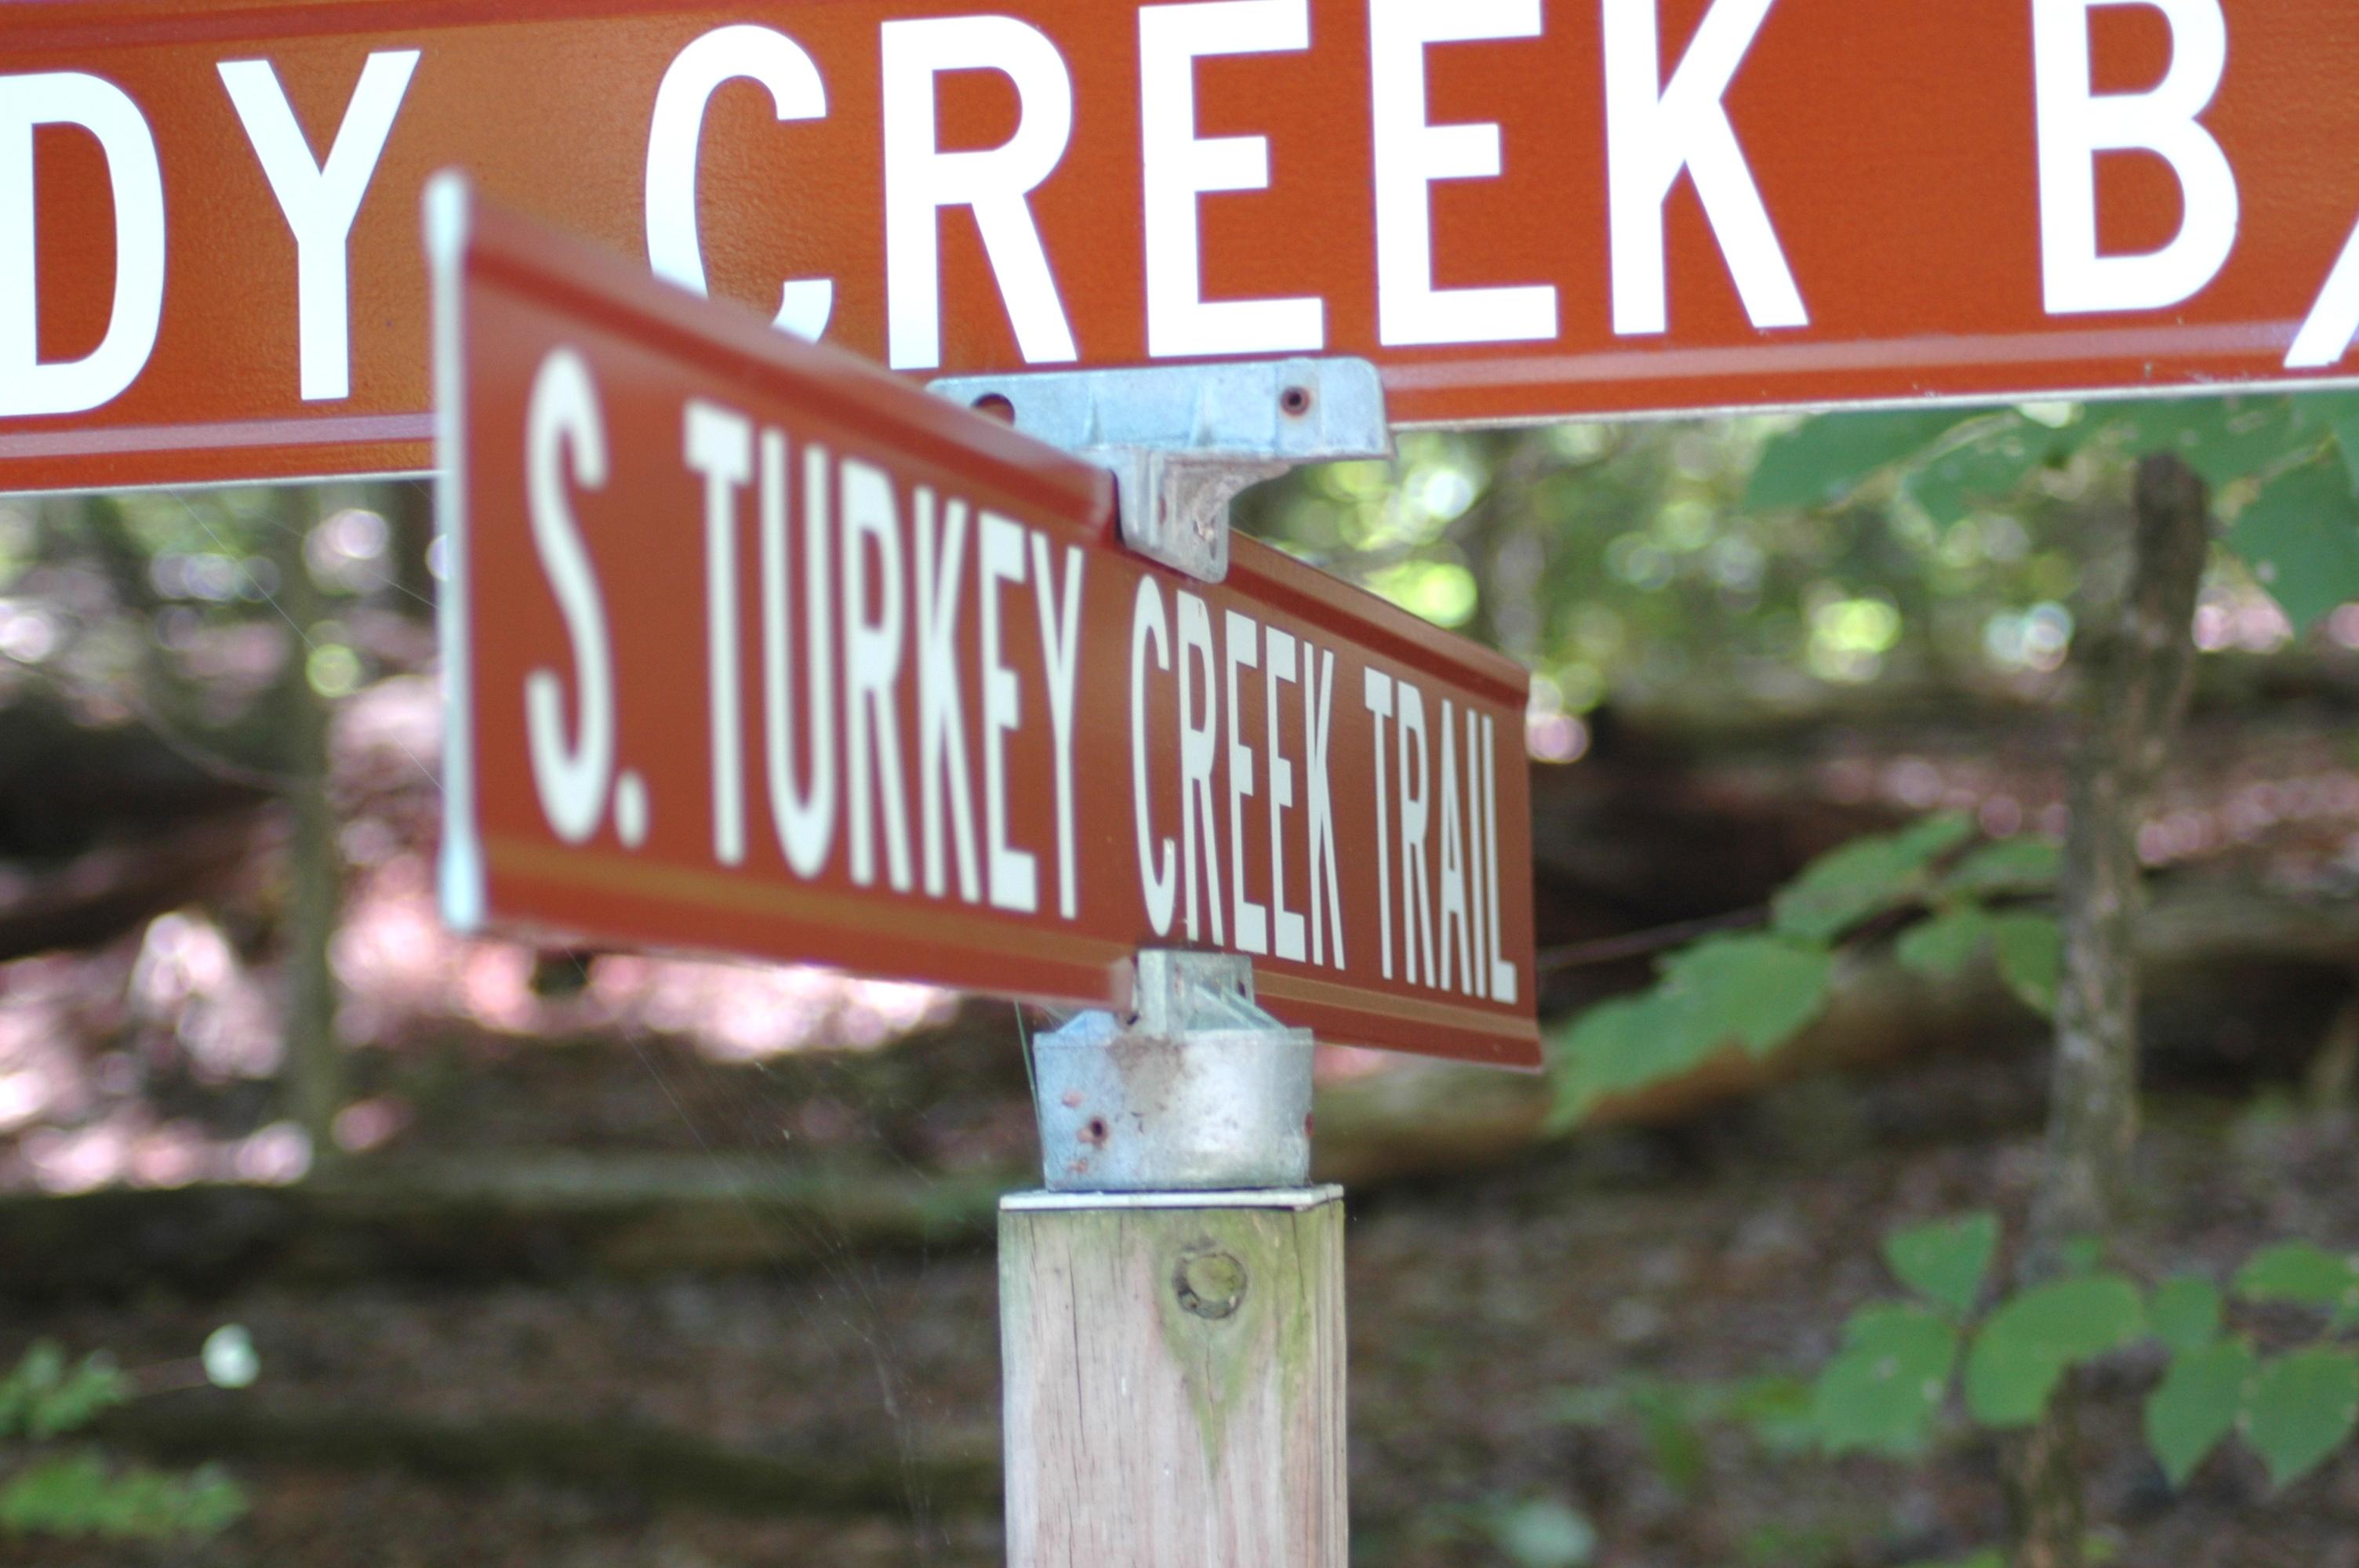 Turkey Creek Sign